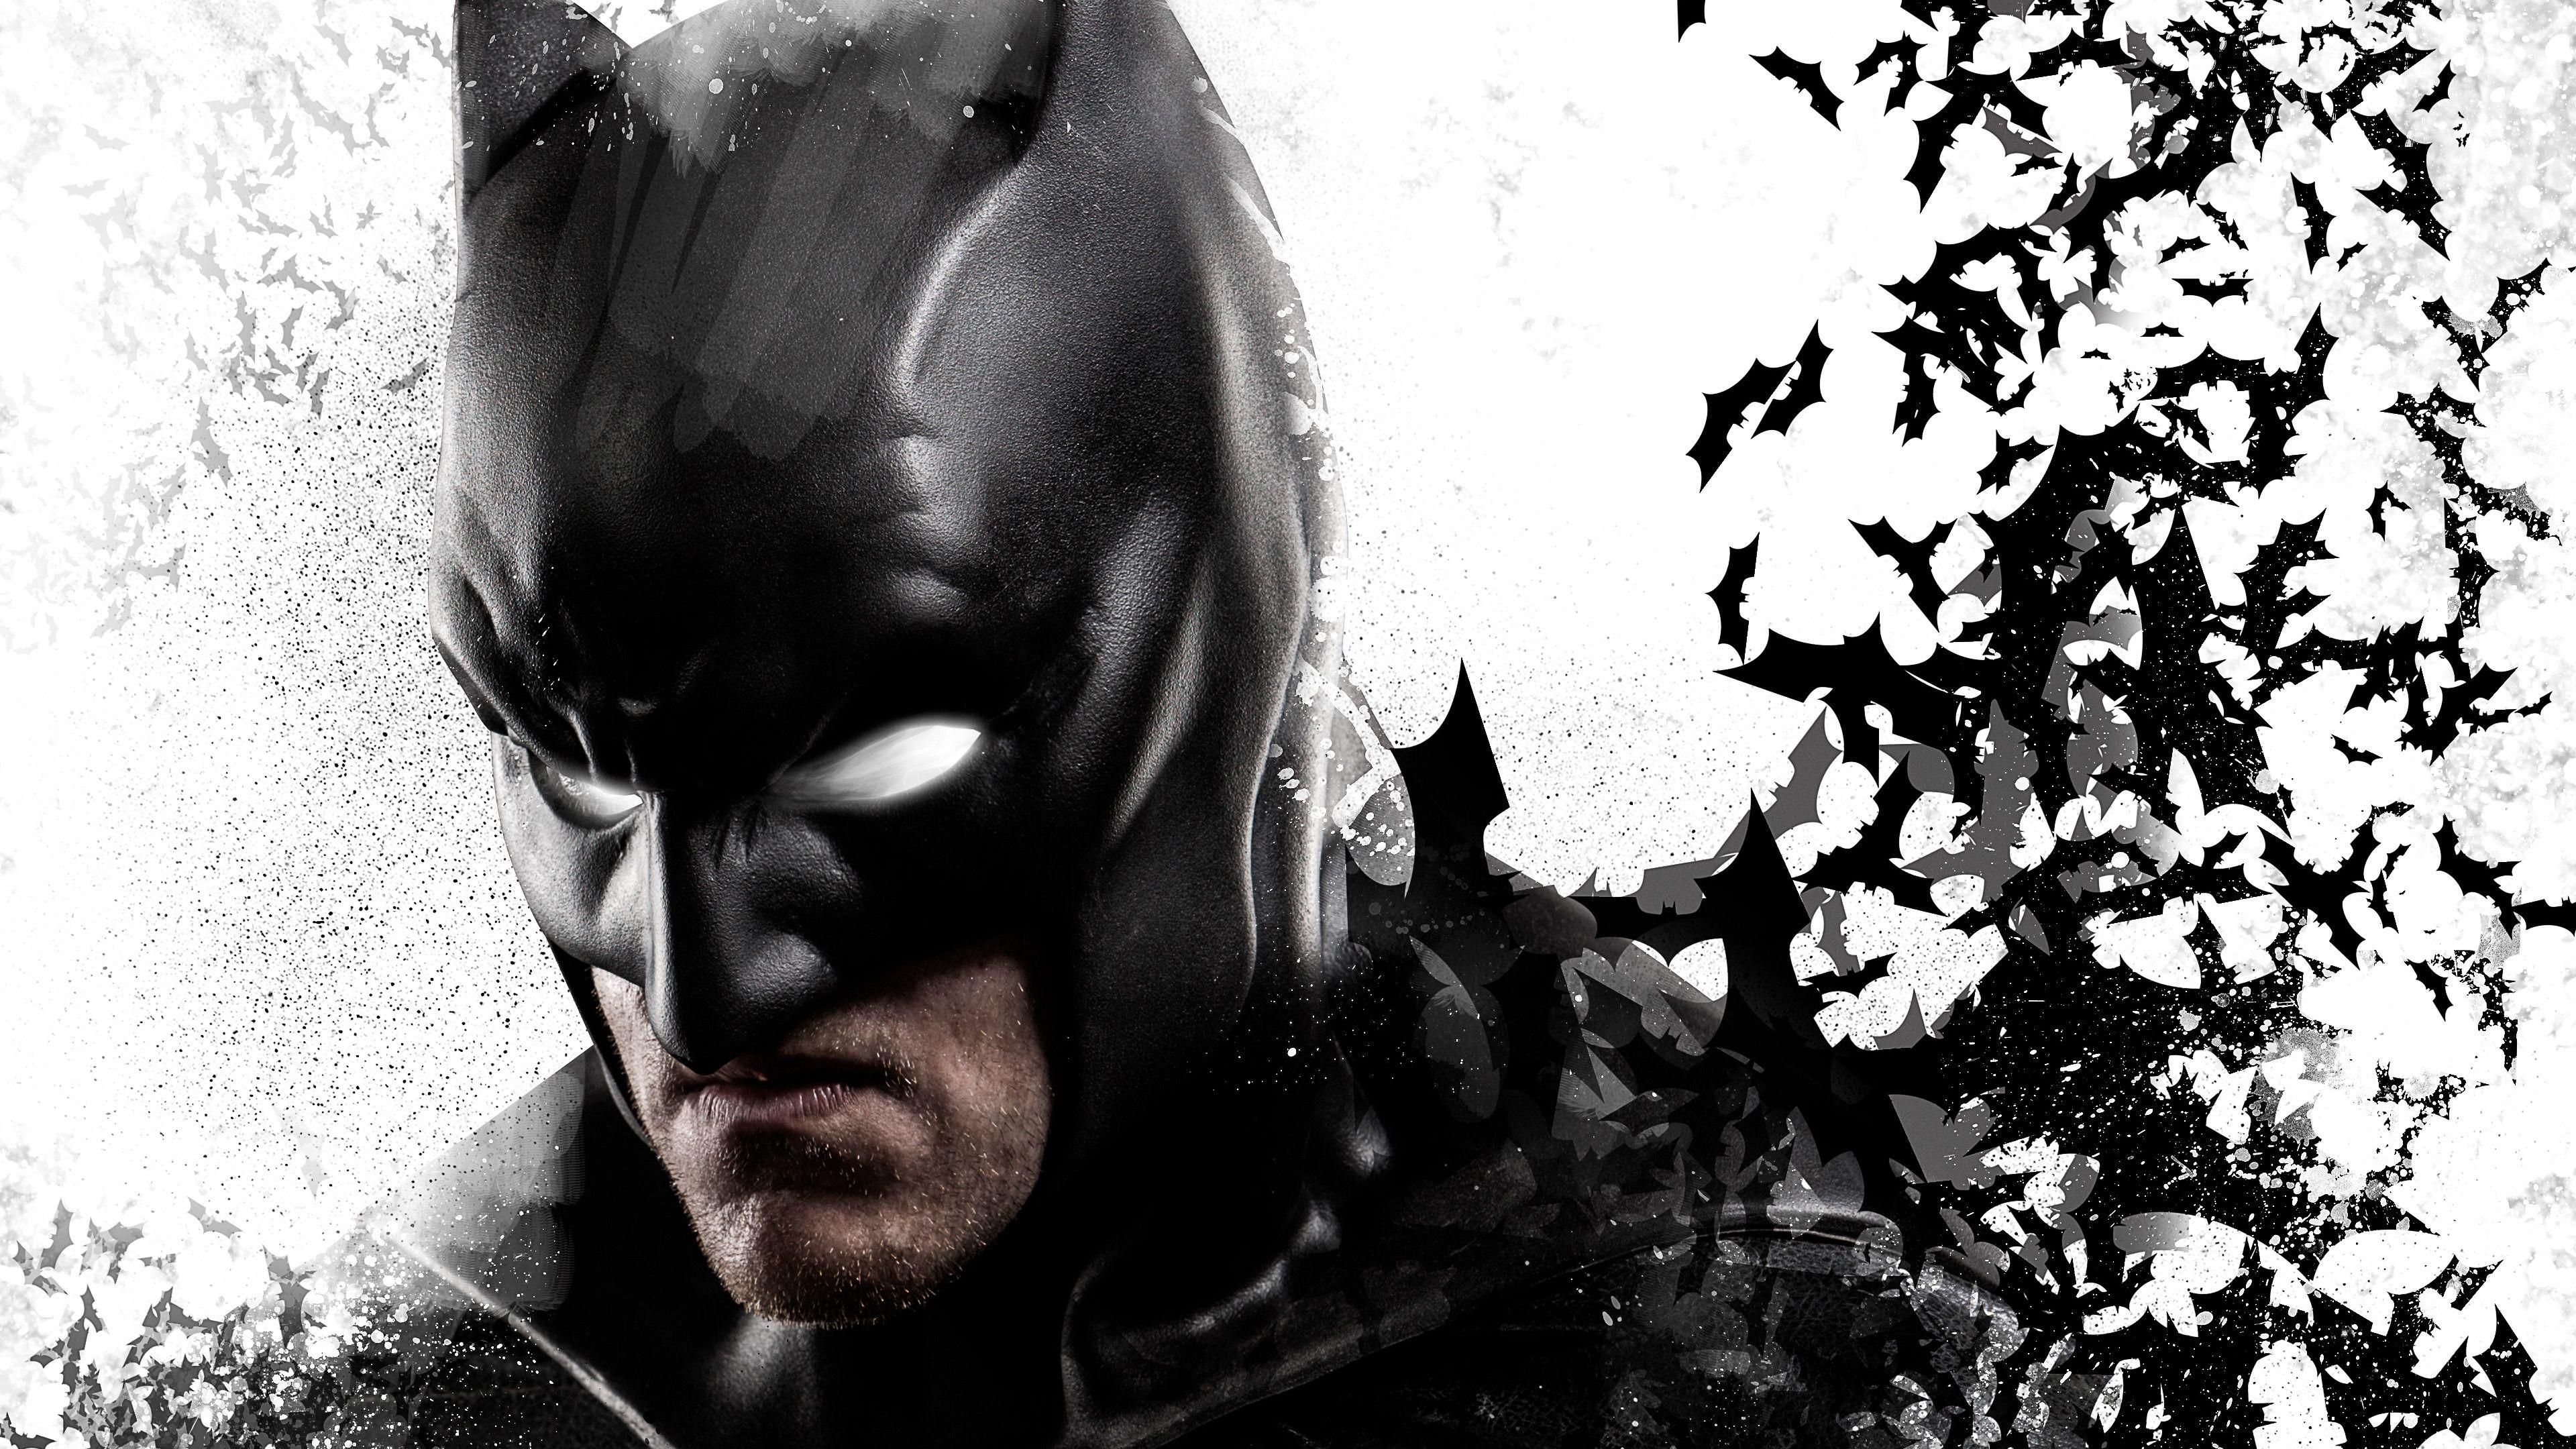 Batman Bats 4k Superheroes Wallpapers Hd Wallpapers Batman Wallpapers 4k Wallpapers Batman Wallpaper Batman Superhero